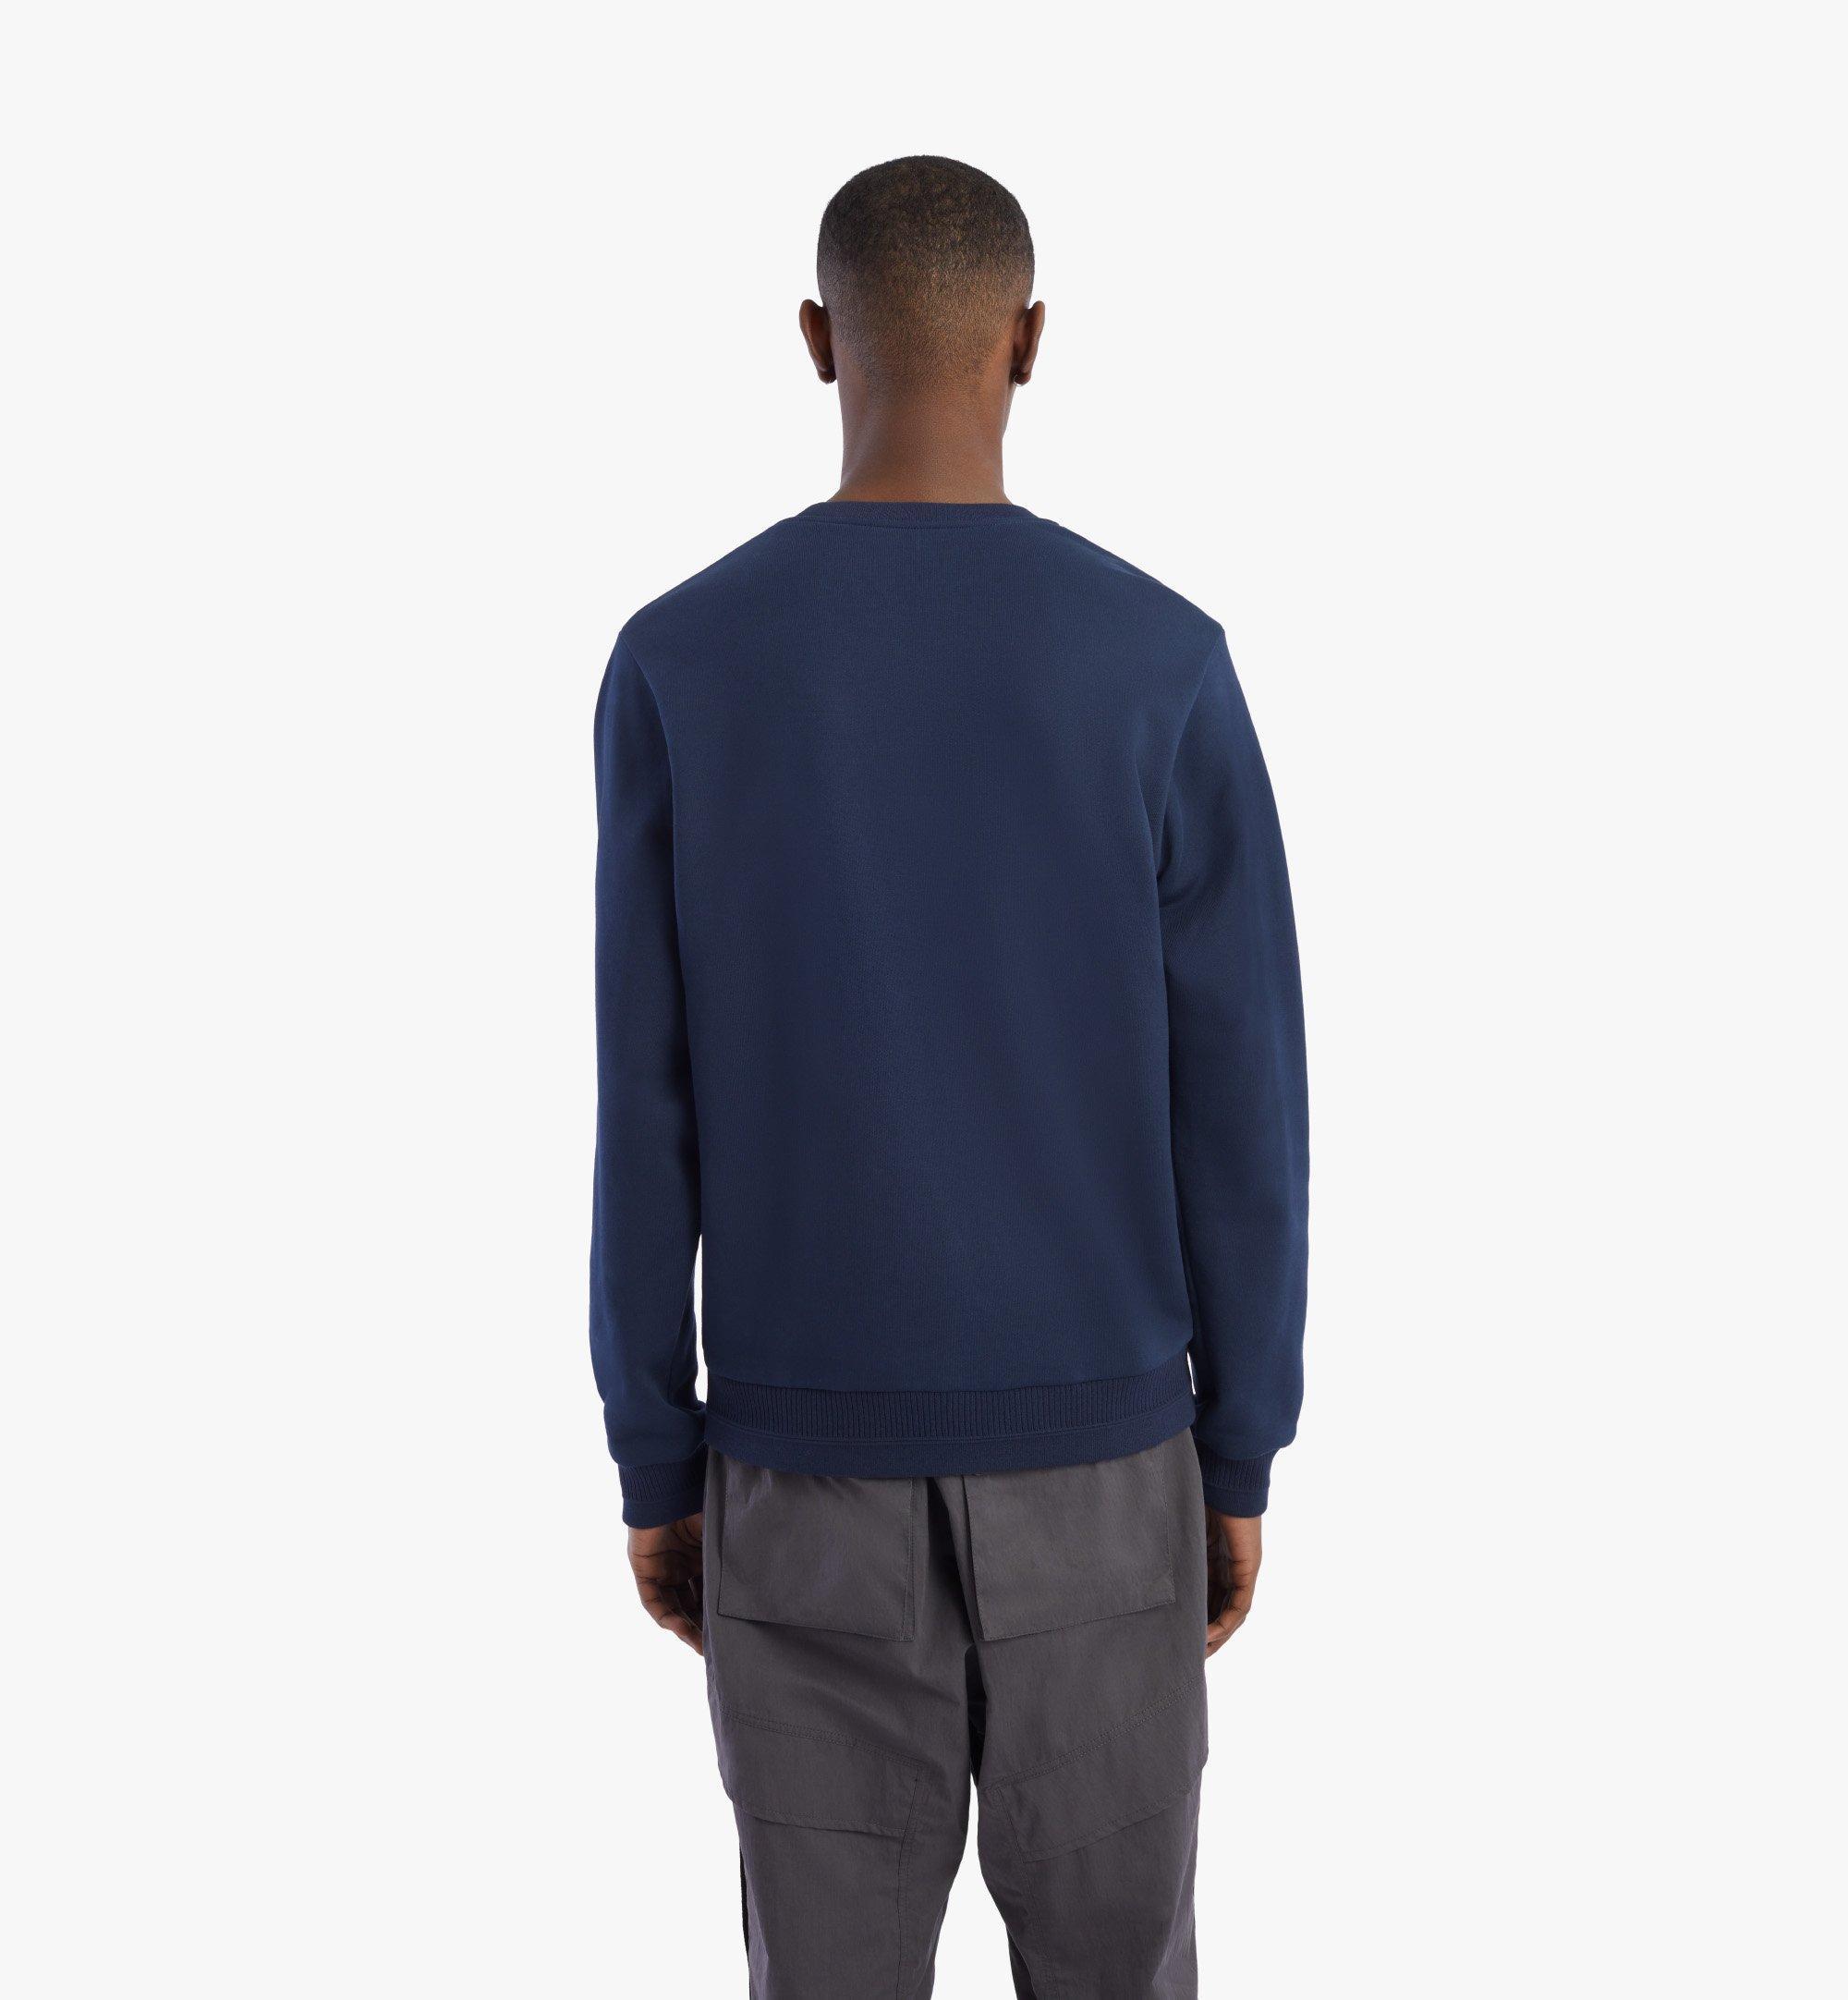 MCM 男士Geo月桂叶运动衫 Blue MHABSMM04U100M 更多视角 3